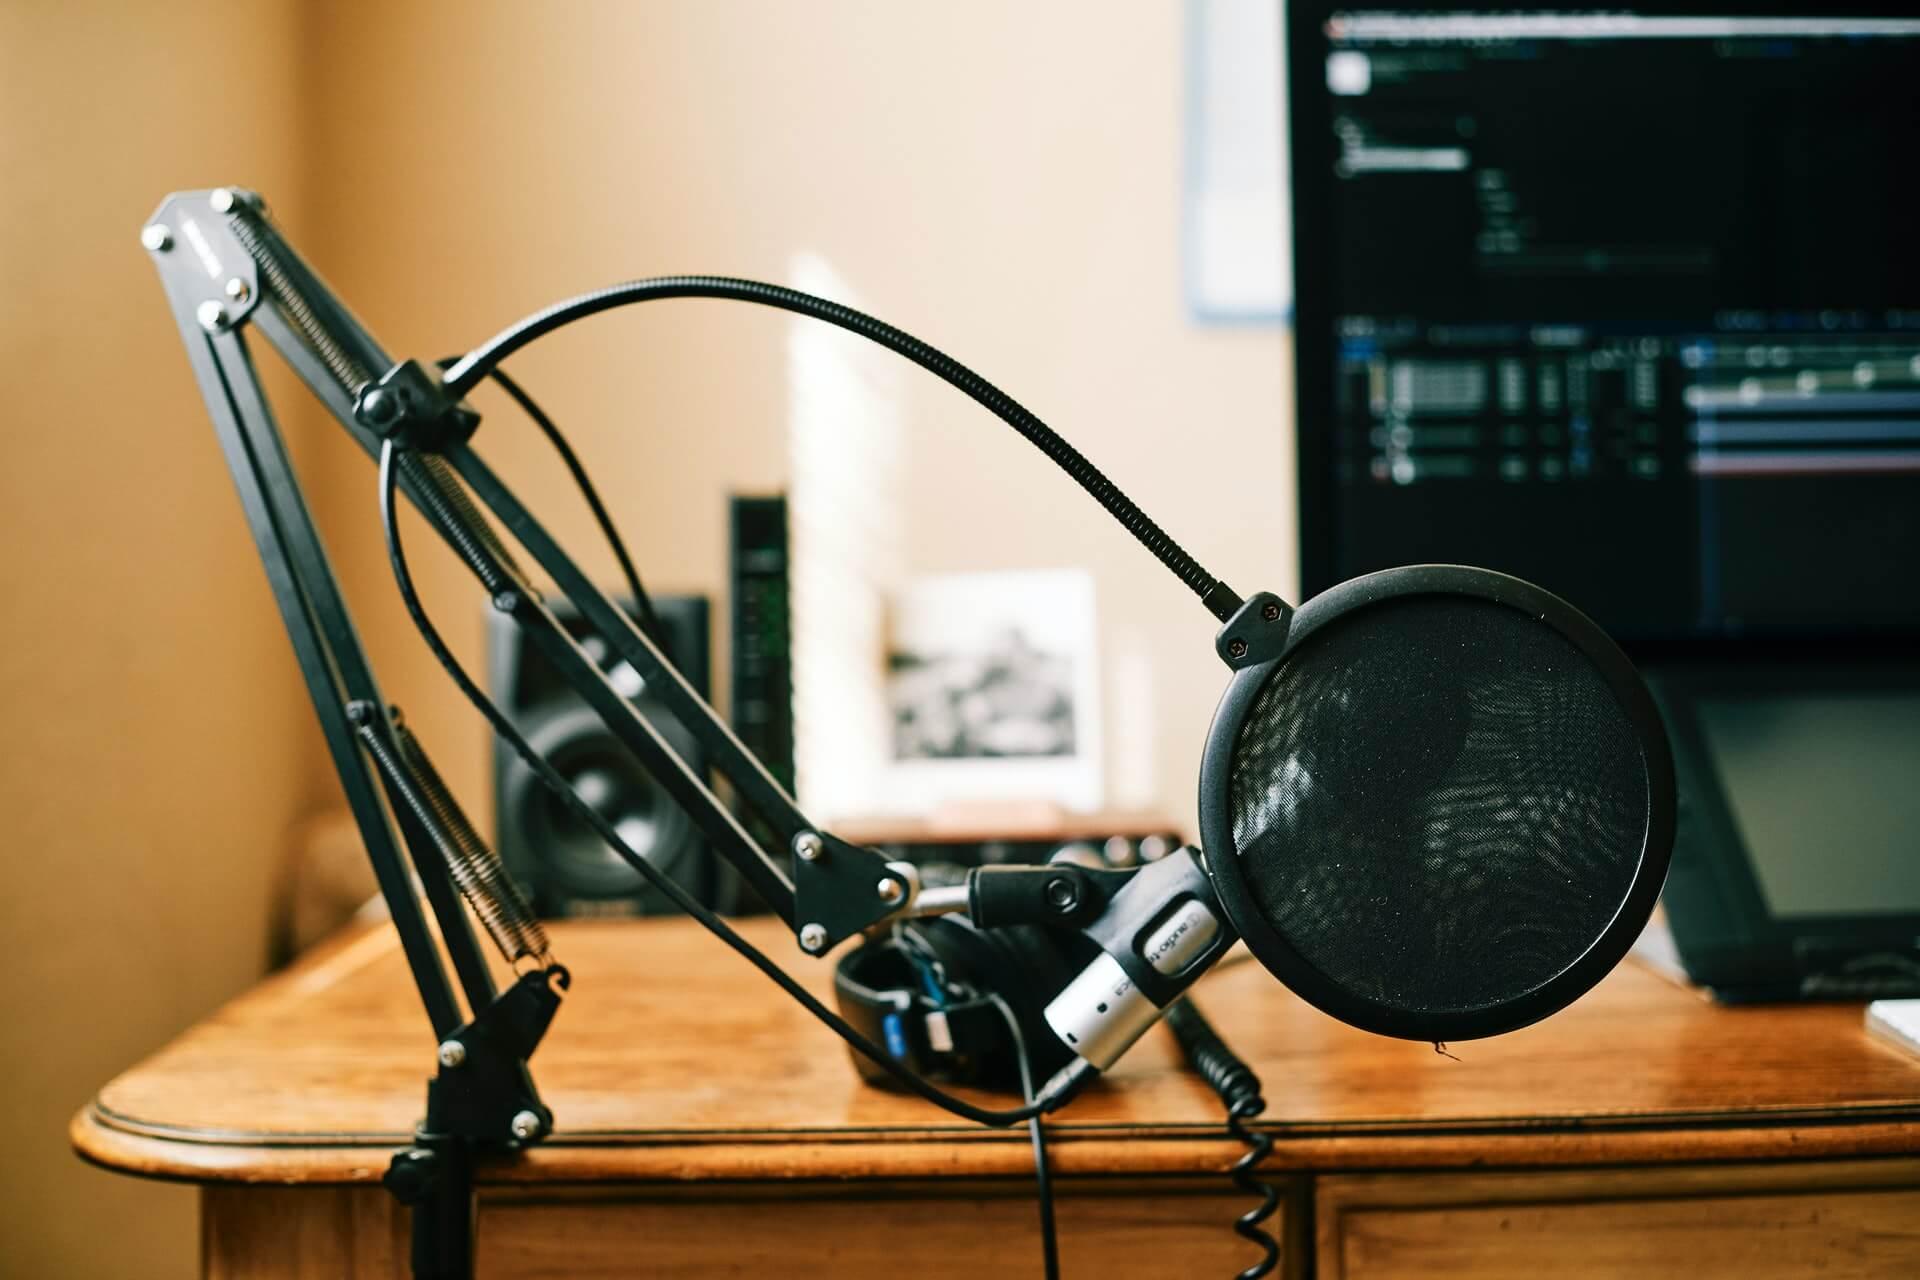 【ADAUDIO 2021】創建引人入勝的Podcast內容!秘訣大公開13種技巧!